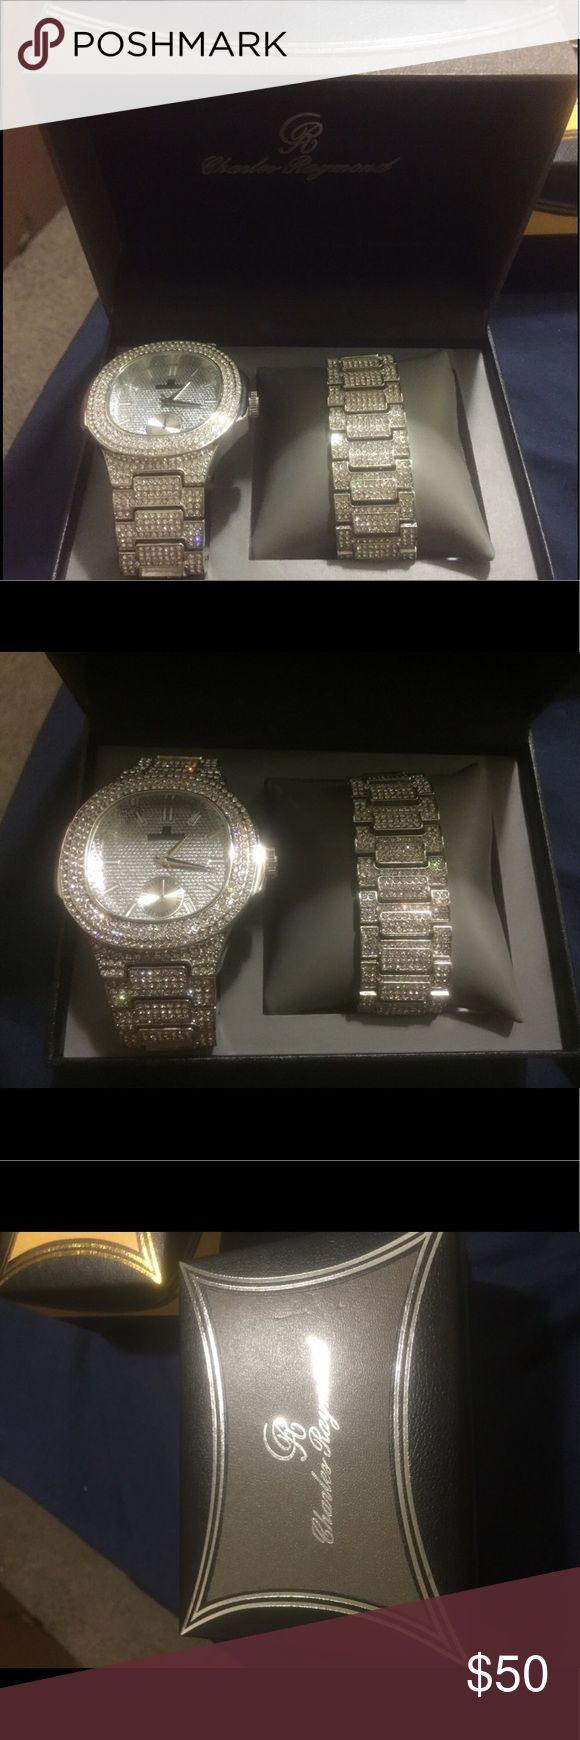 Watch set Charles Raymond watch set wit matching bracelet charles raymond Accessories